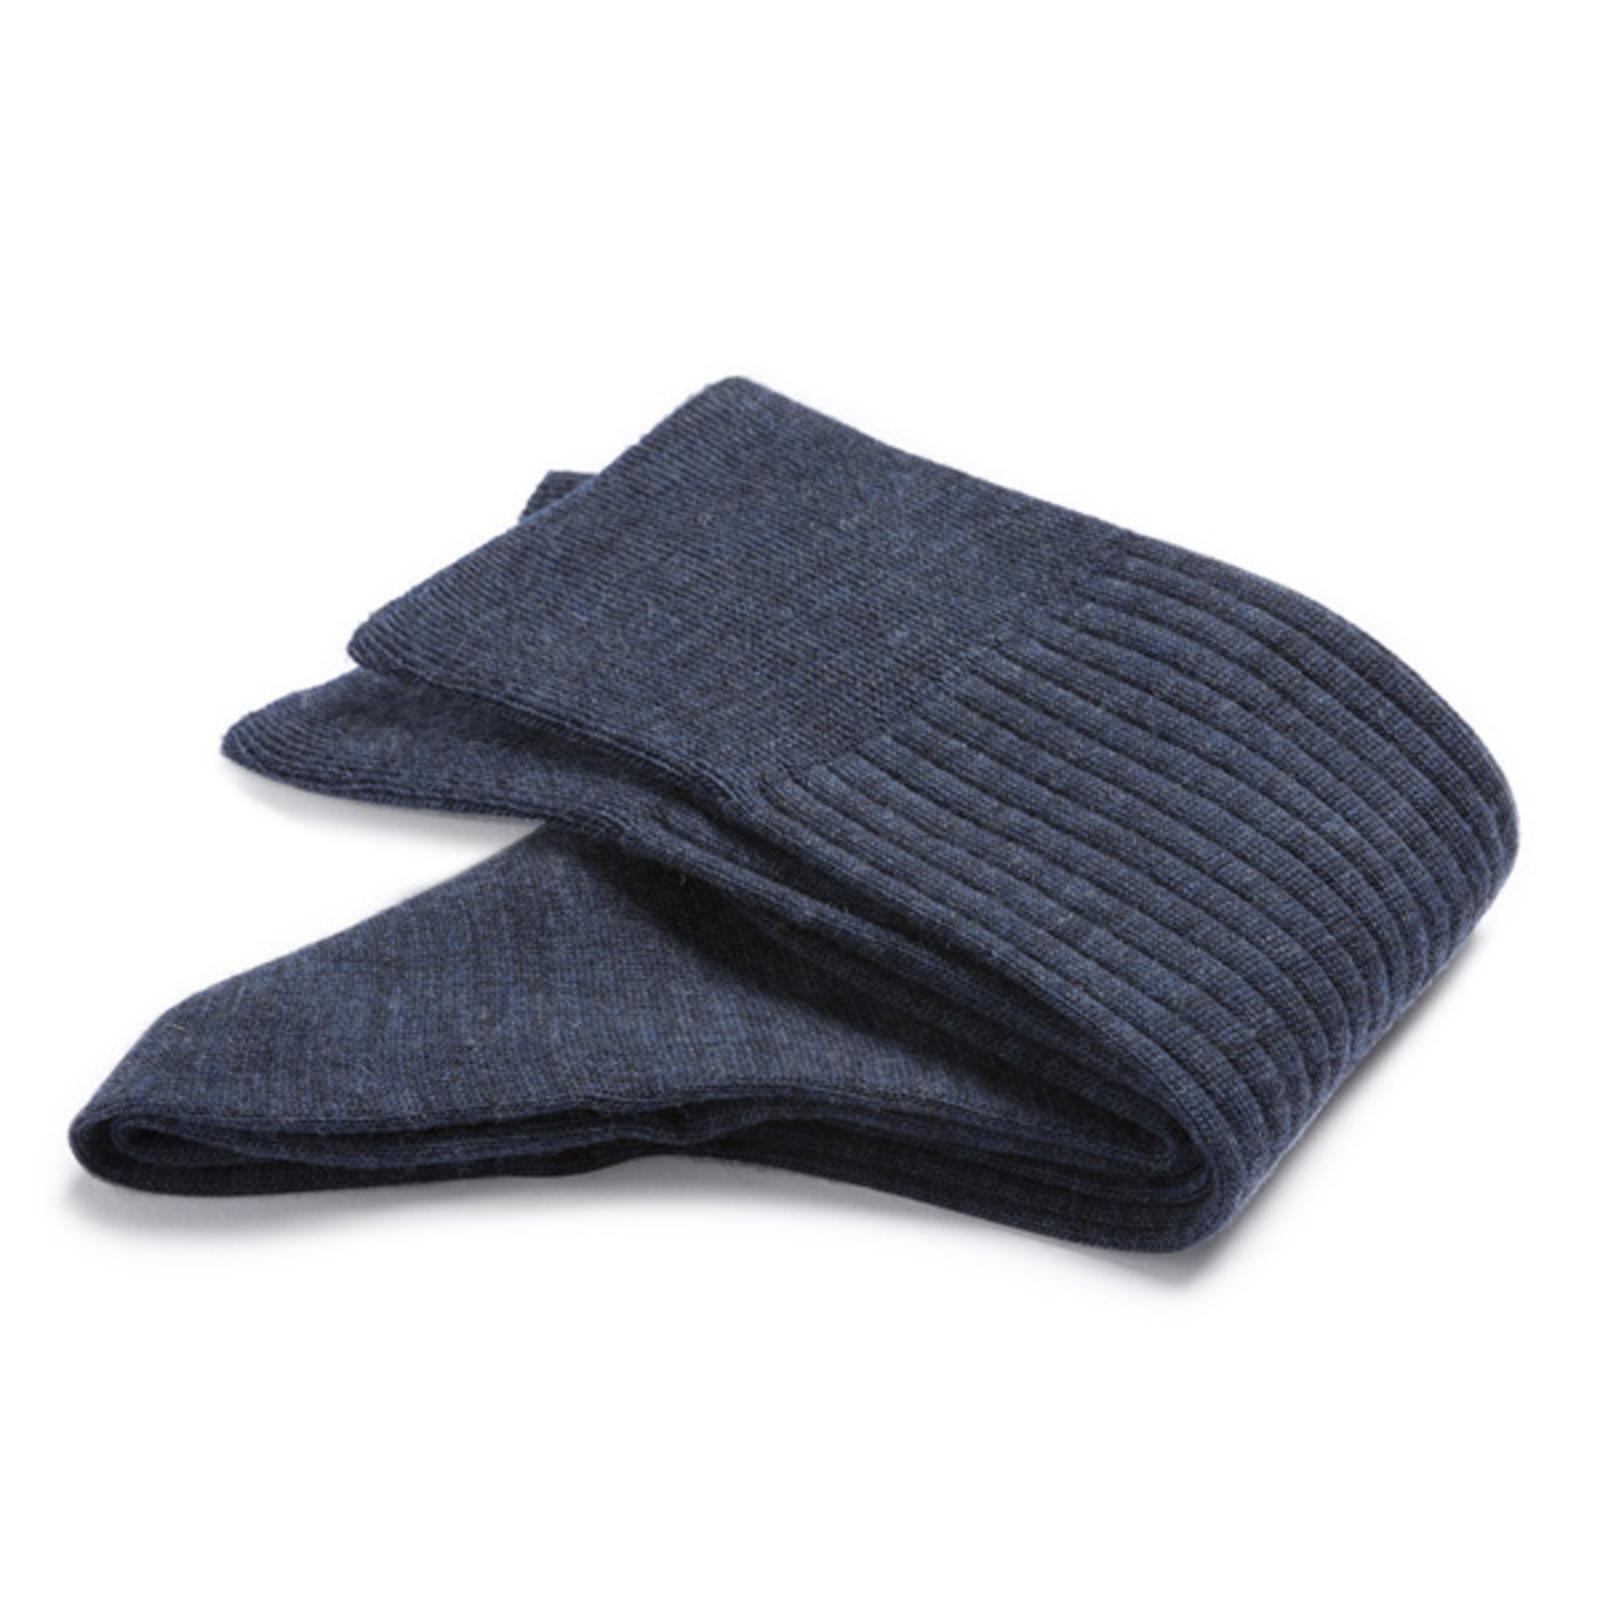 Carlo Lanza Königsblaue Merino Wolle Socken